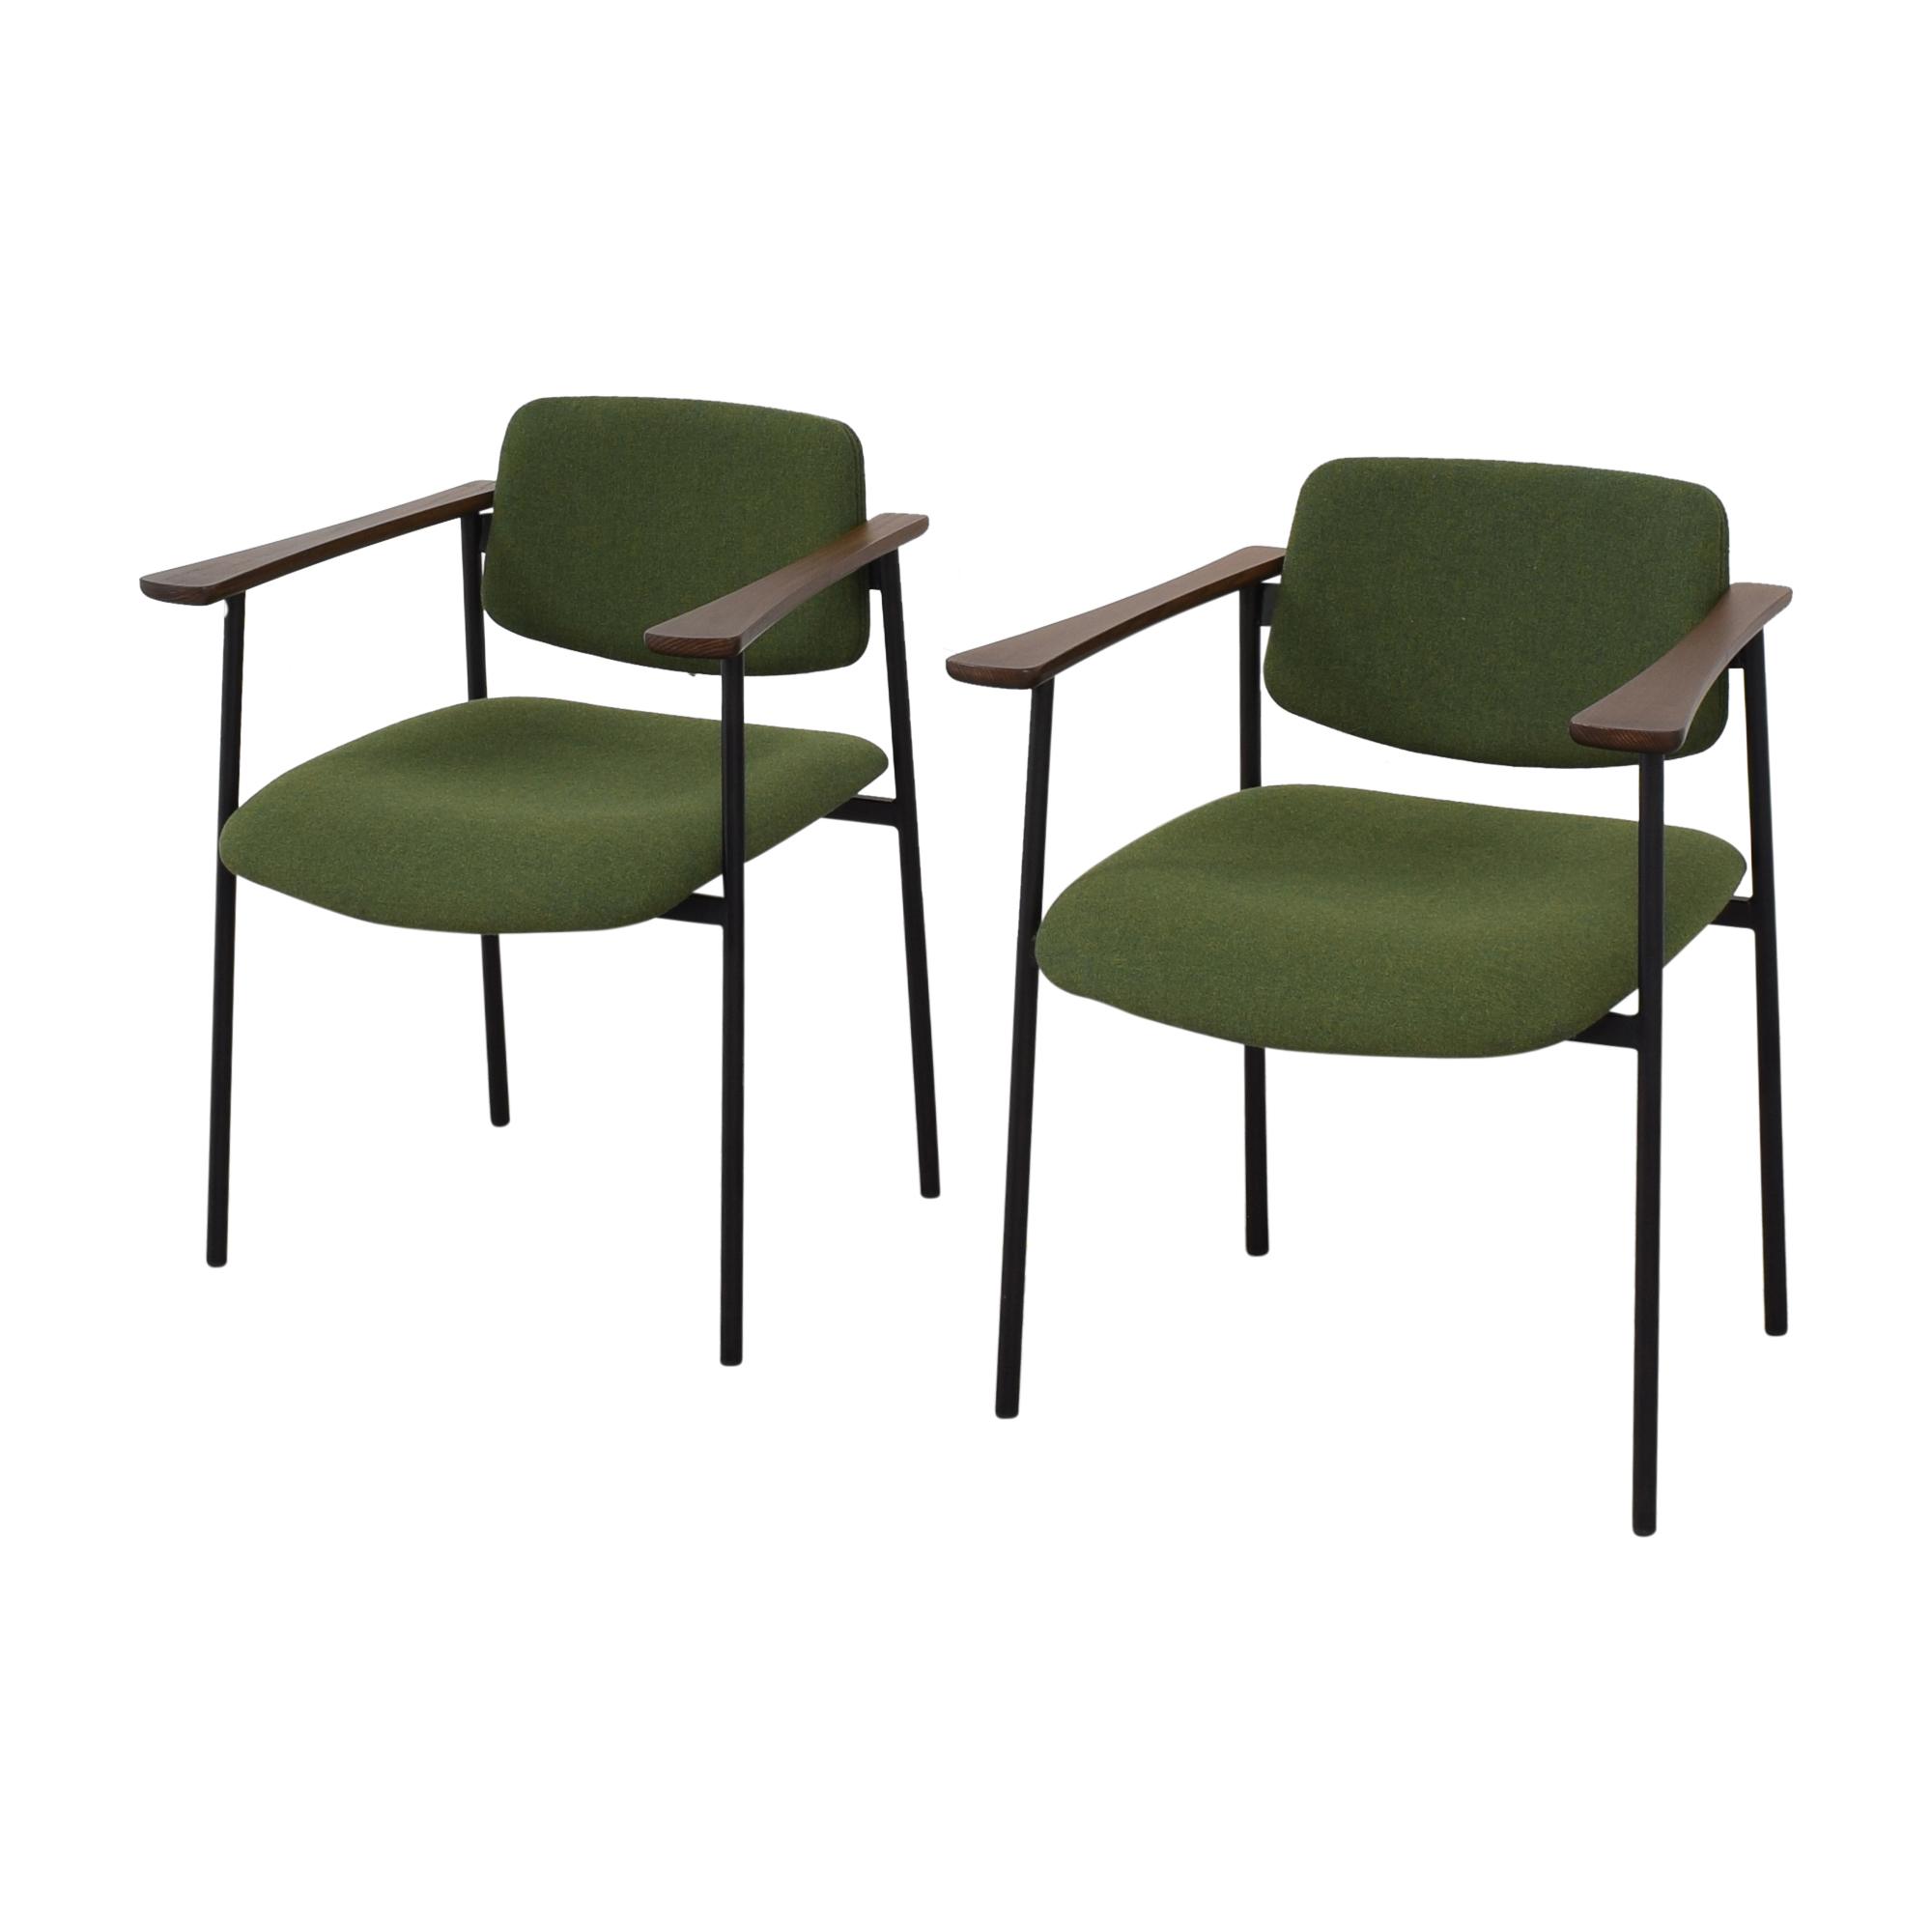 CB2 CB2 Warren Green Chairs nj